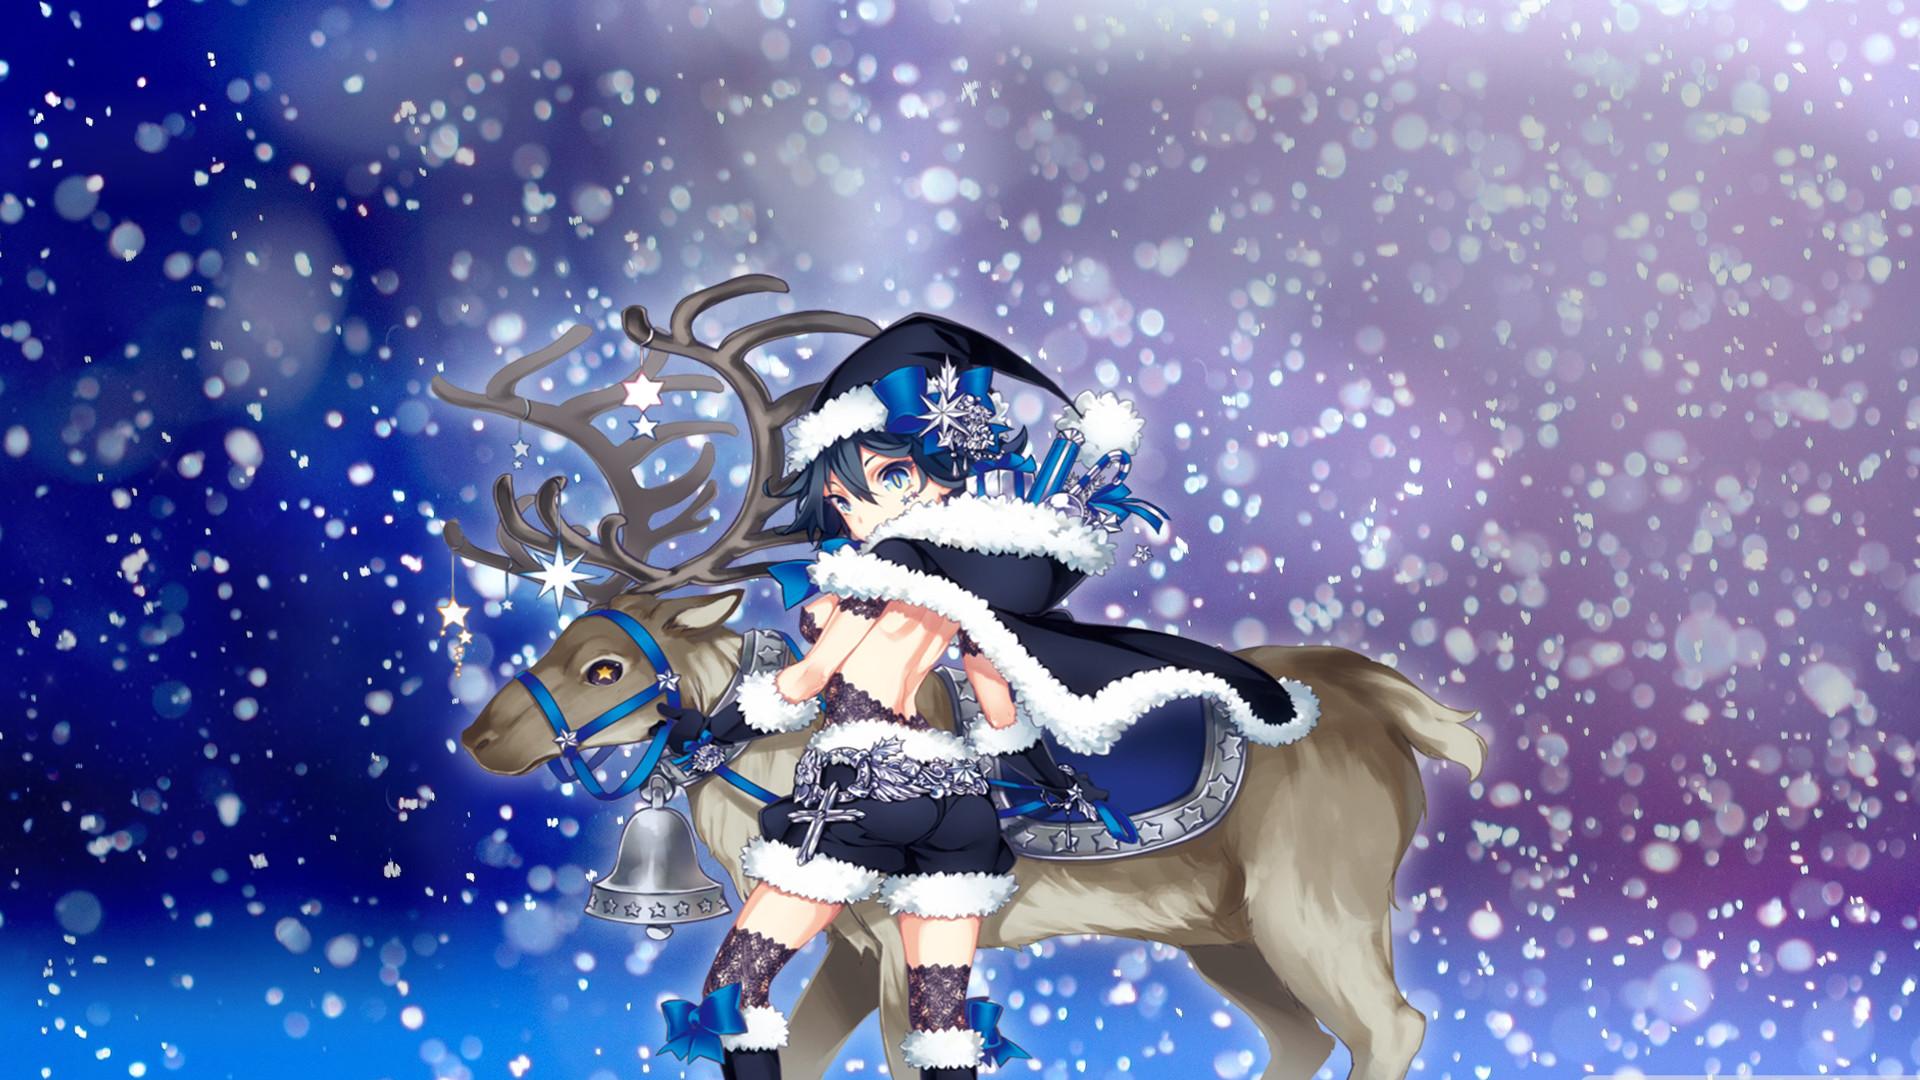 Happy Holidays Anime Girl Wallpaper 1920x1080 Anime Christmas Wallpaper Hd 70 Images